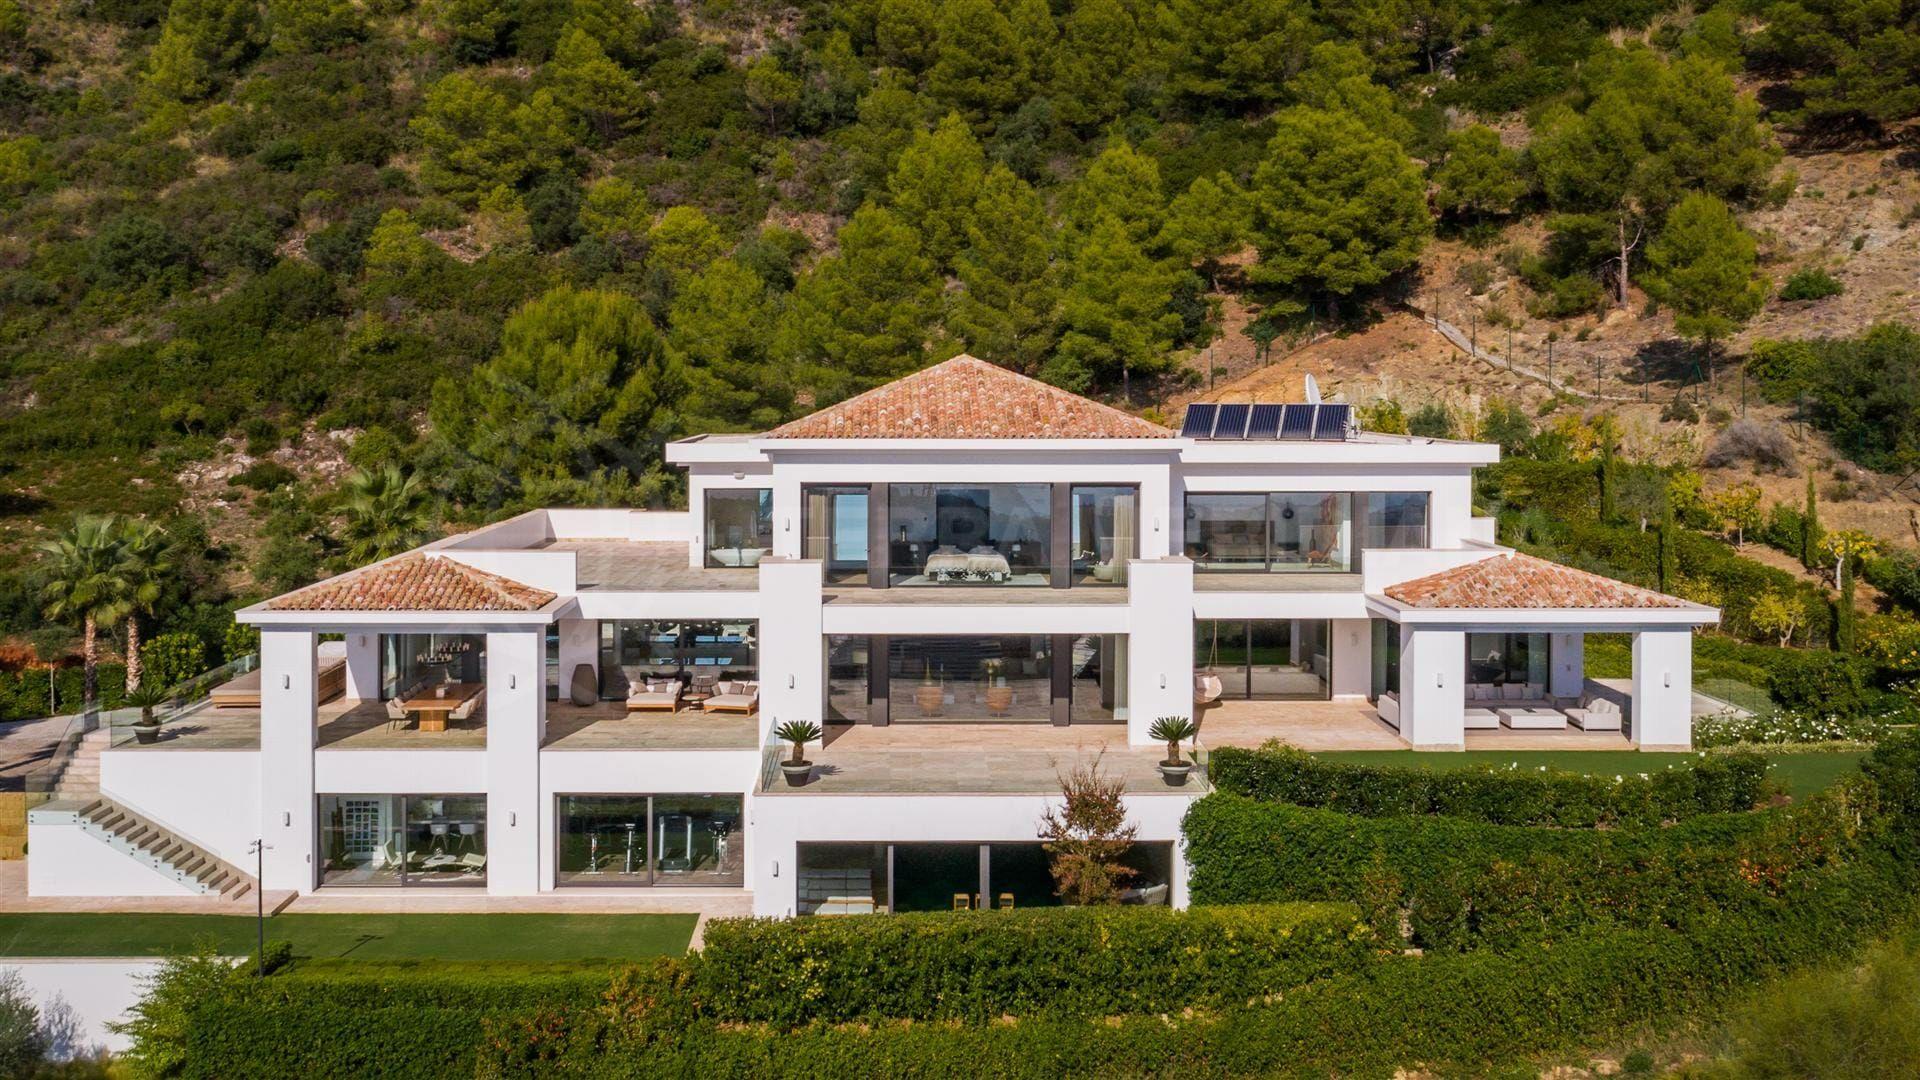 Propriété exclusive de Terra Meridiana, Villa Camojan reçoit son certificat d'habitabilité